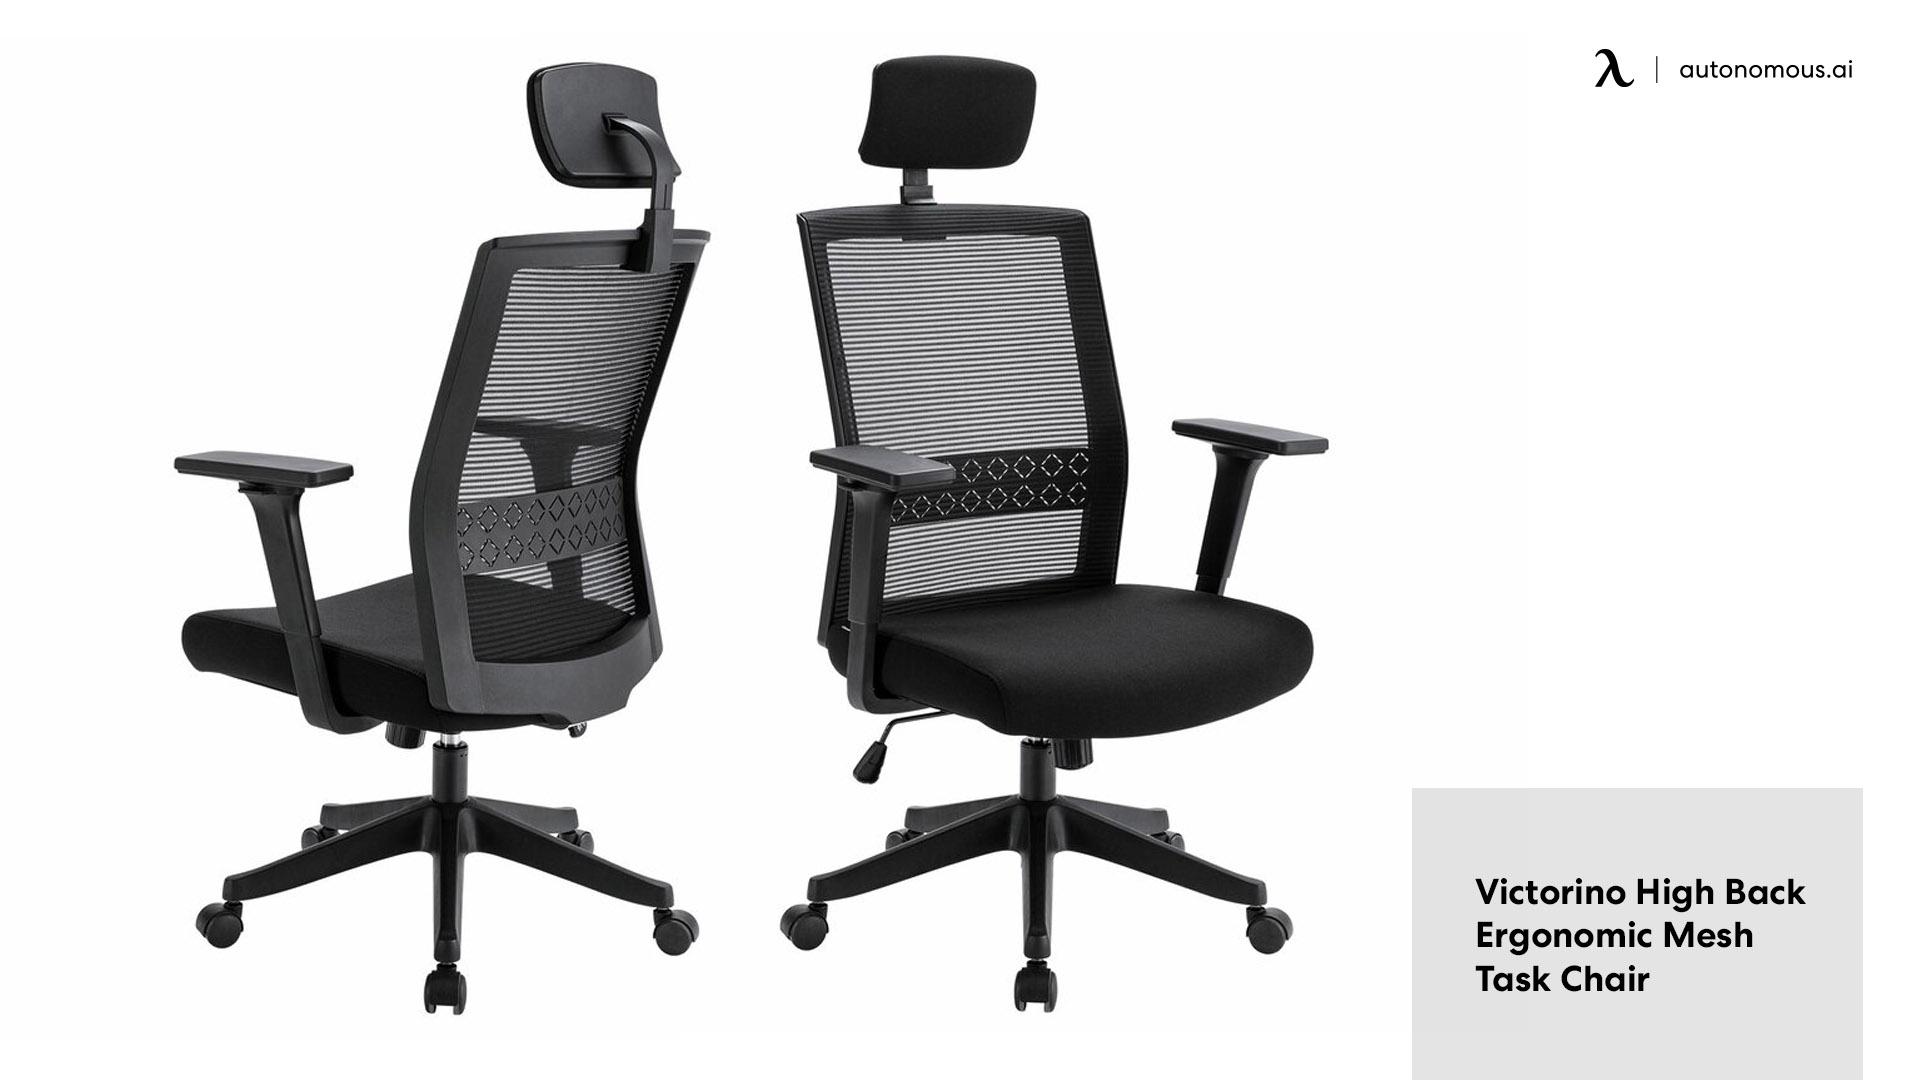 Victorino High Back Ergonomic Mesh Task Chair